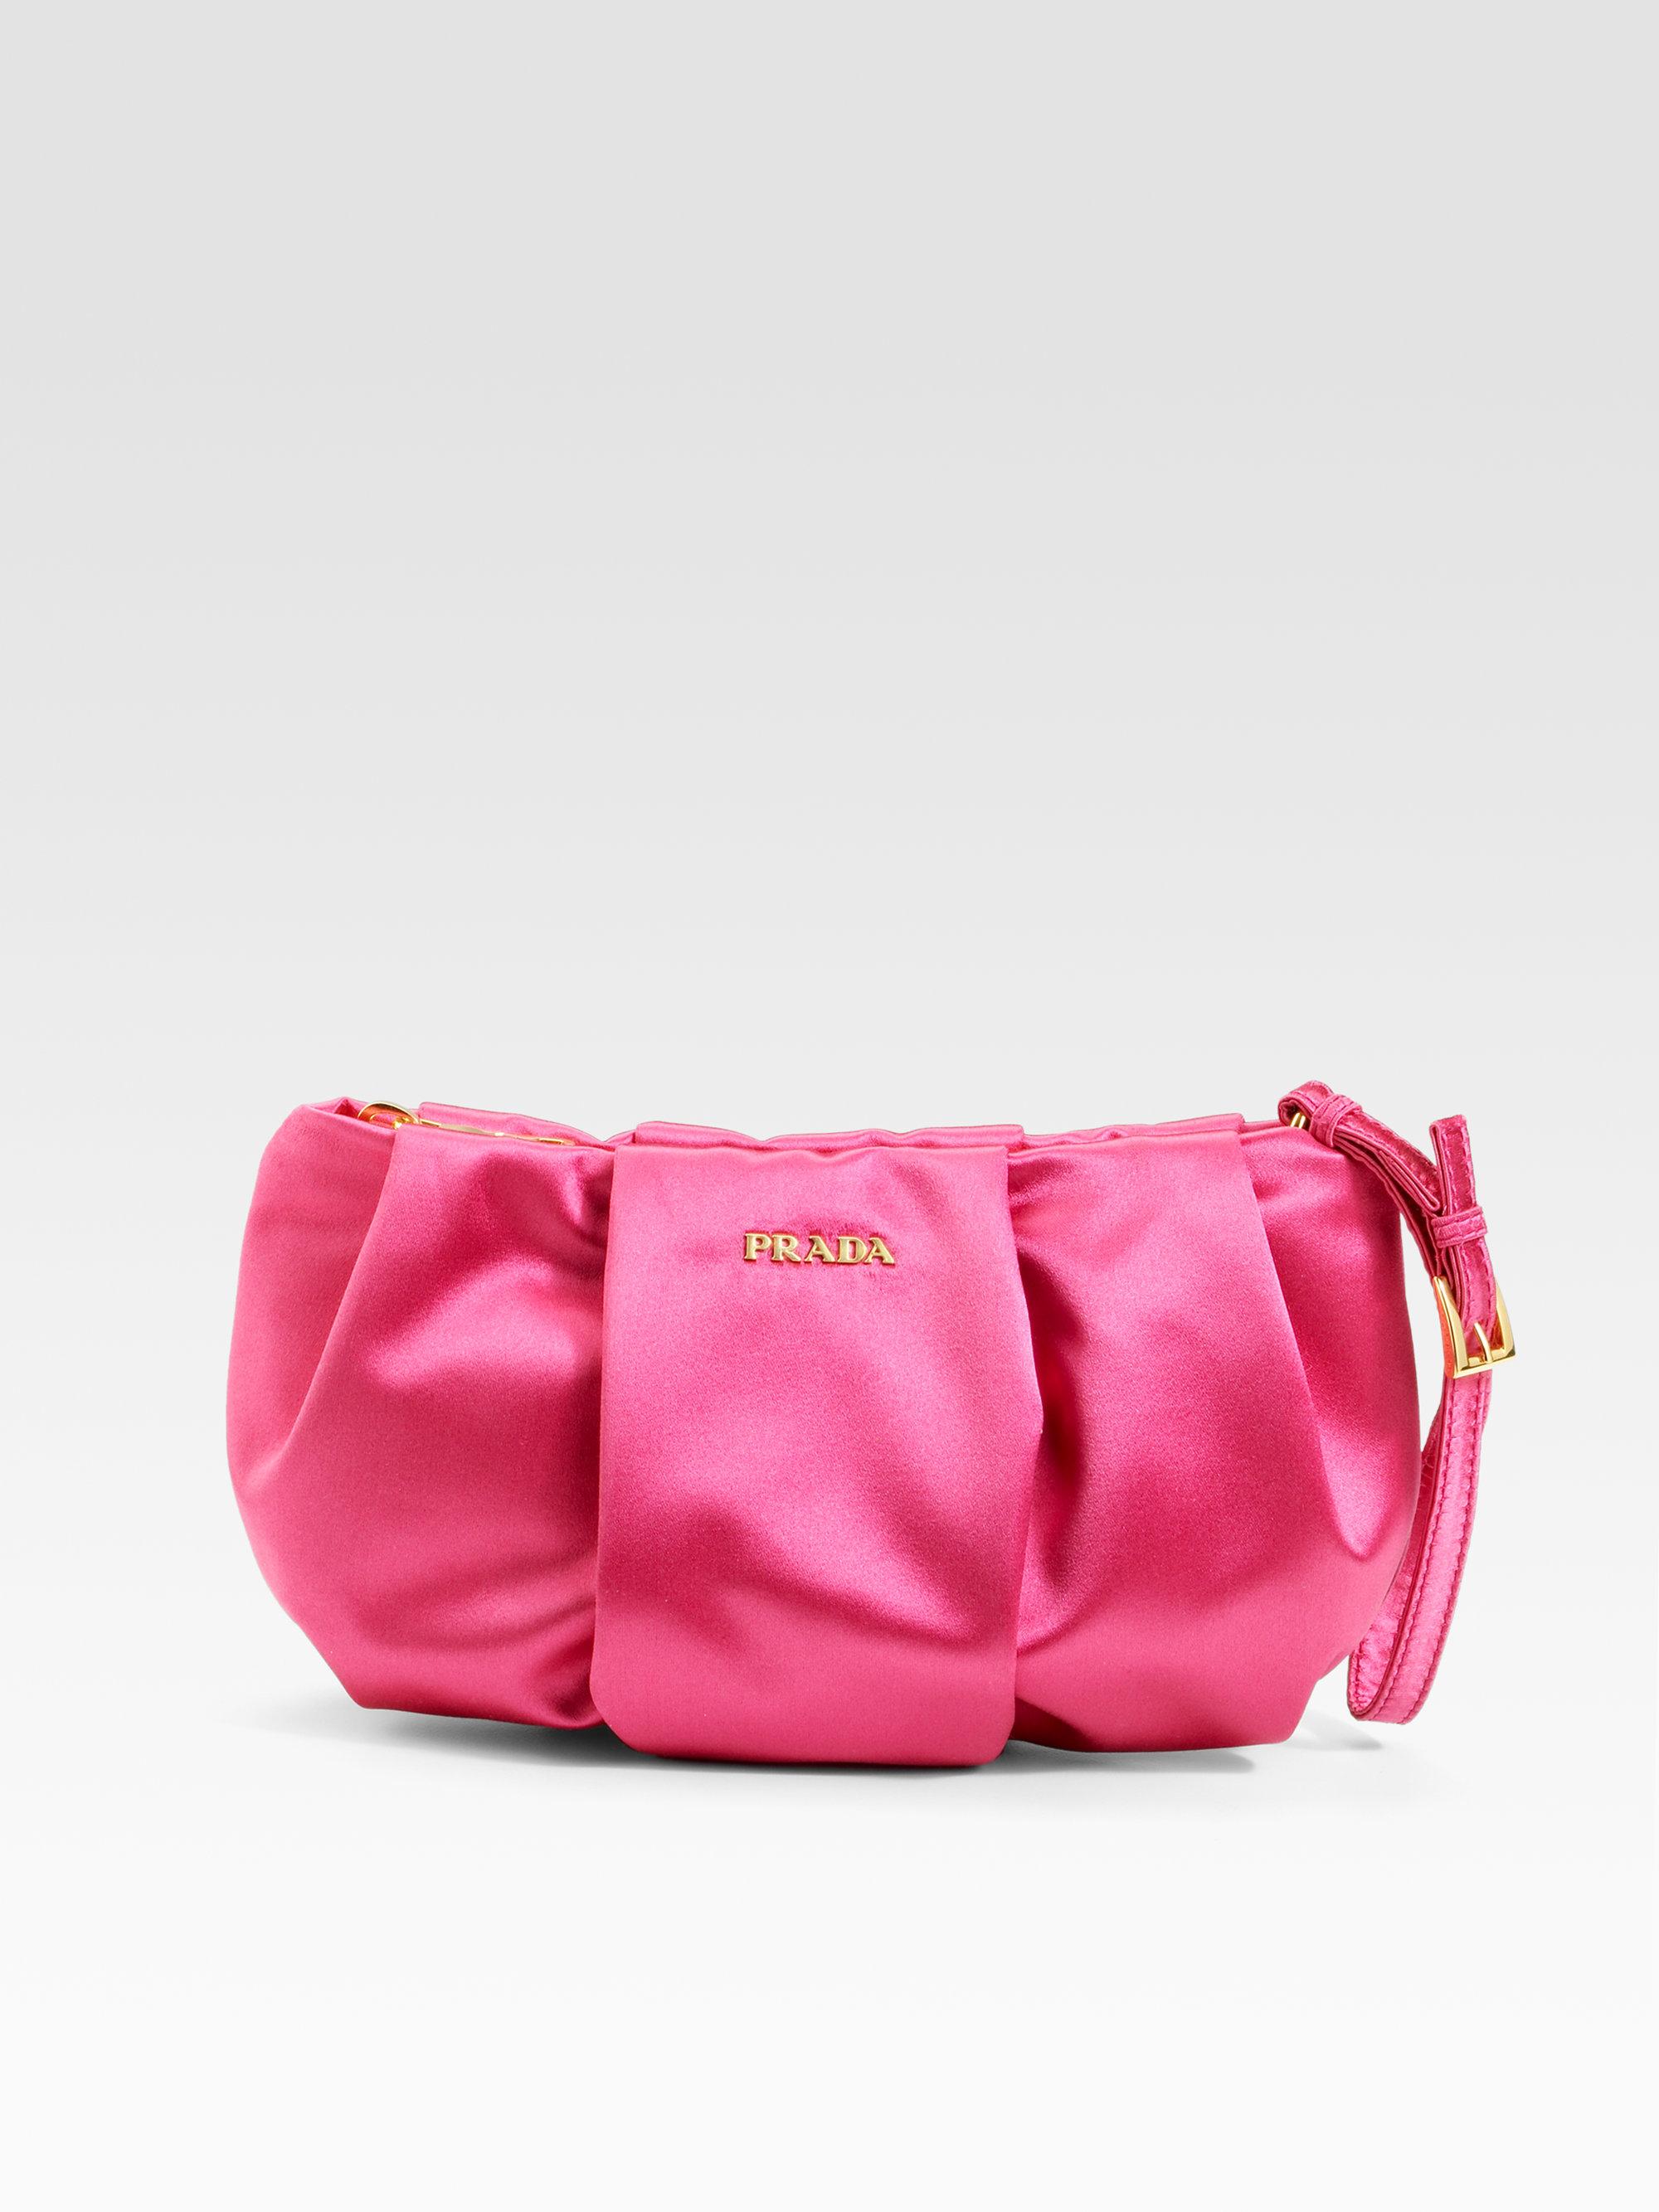 Prada Satin Wristlet Bag in Pink (fuxia)  6b3cdabd47ea0